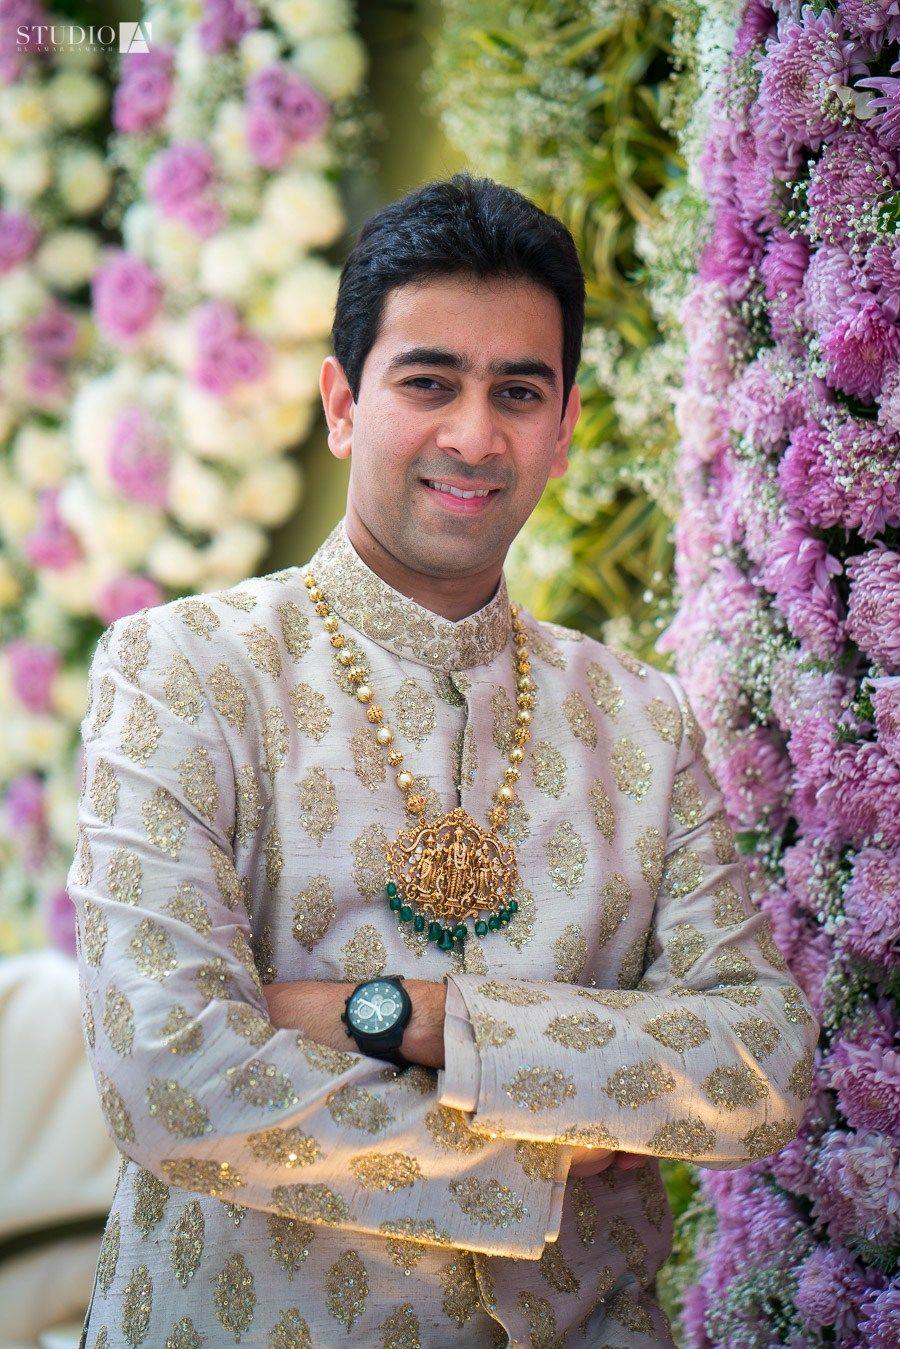 Studio-A Wedding Photography Chennai